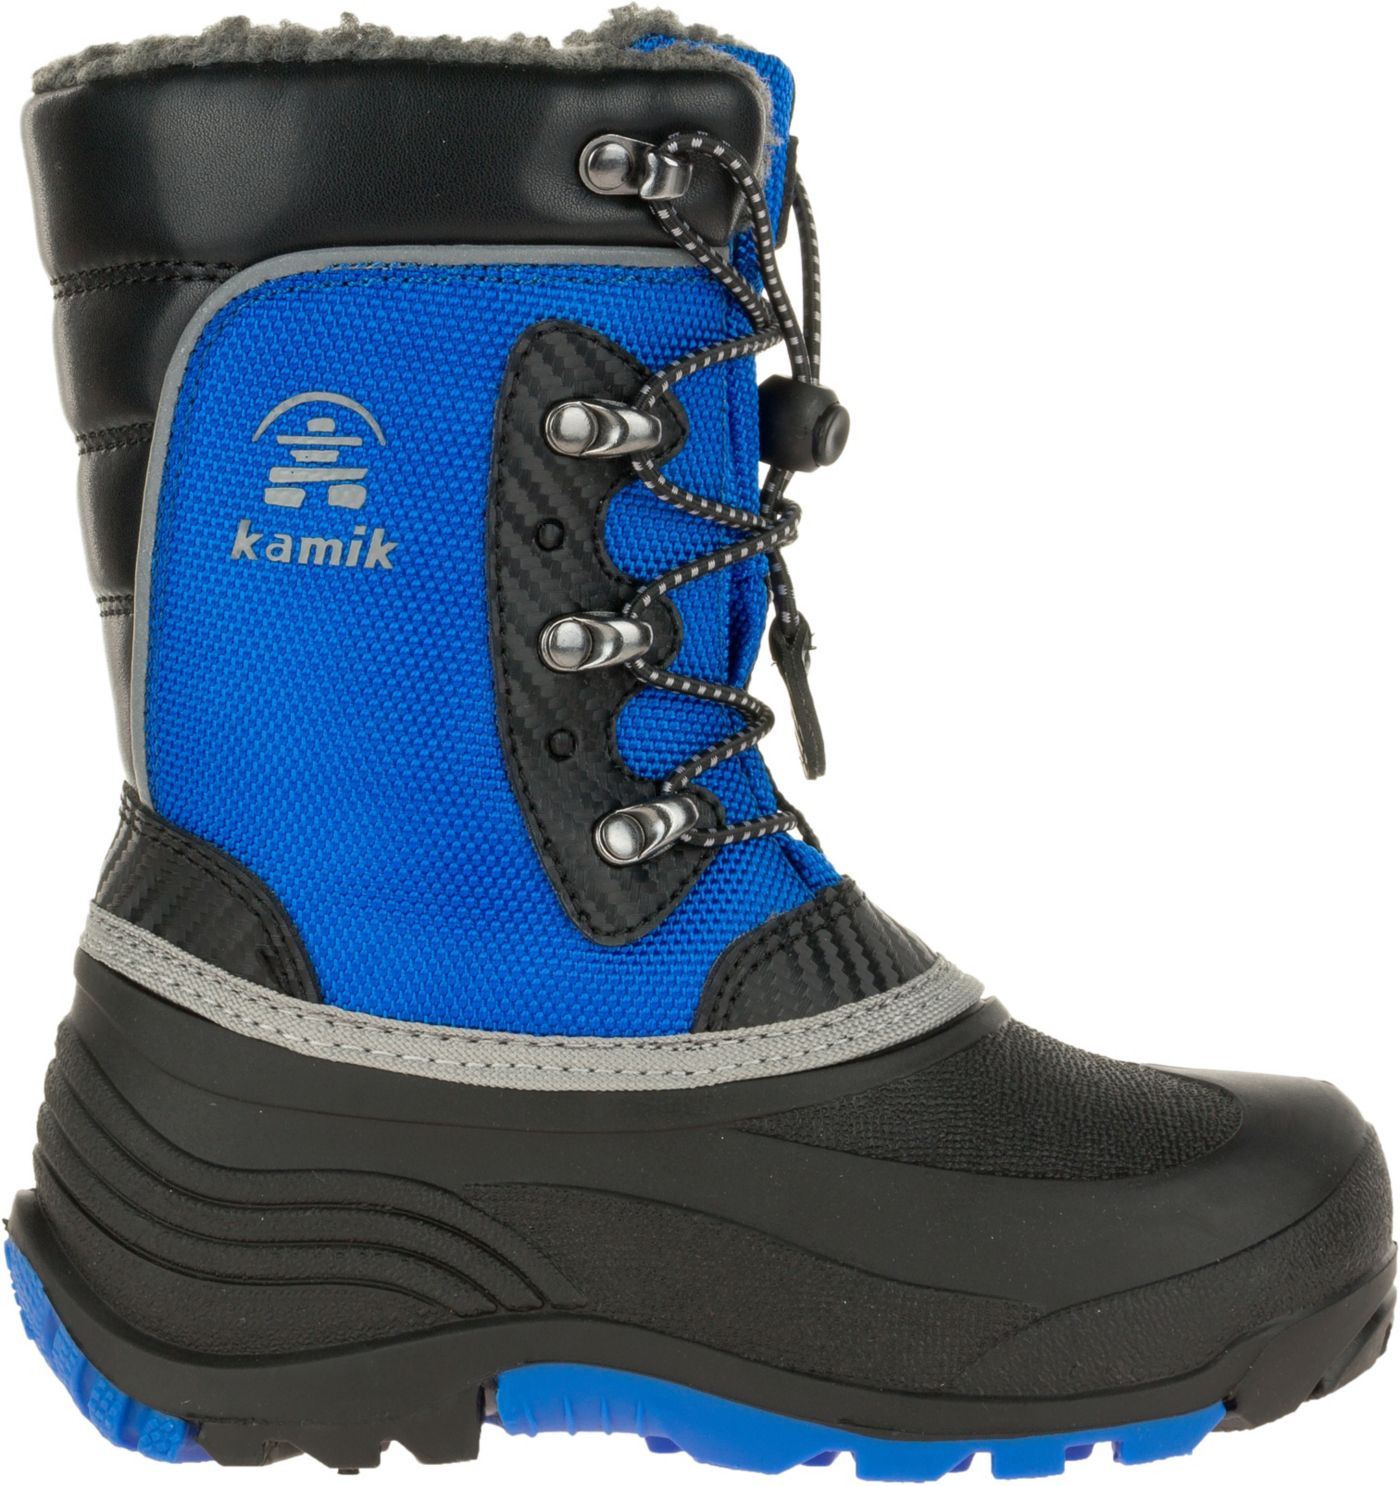 Kamik Kids' Luke Insulated Waterproof Winter Boots